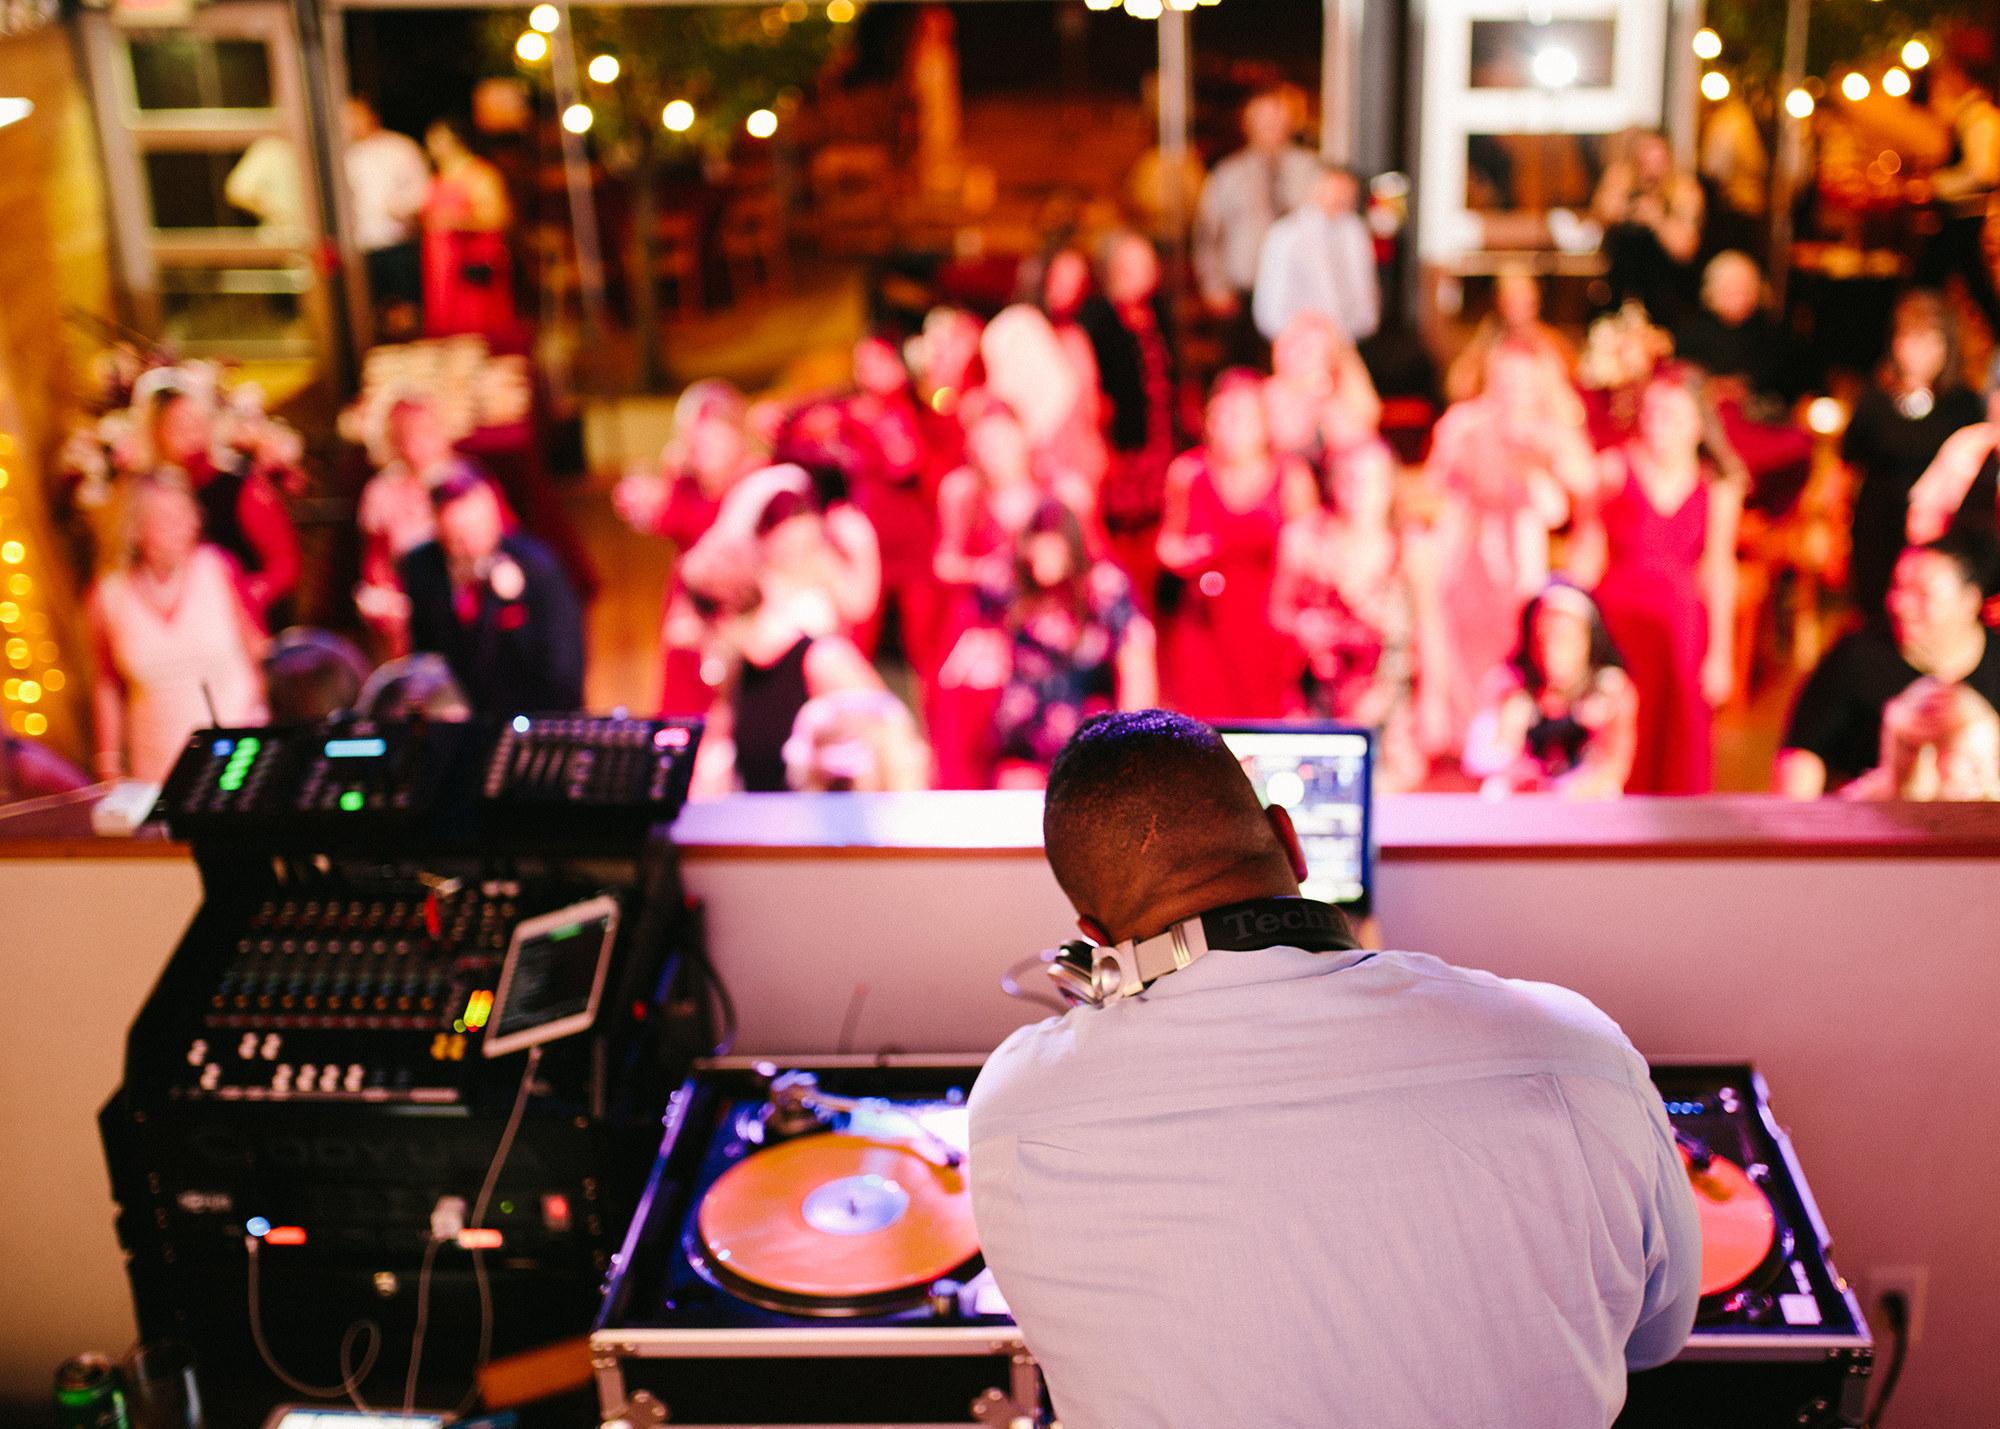 DJs - Fernando ProductionsDJ Alex ReedElite SoundsIcon Event GroupJukeboxx Media Elite EventsHiRise DJs